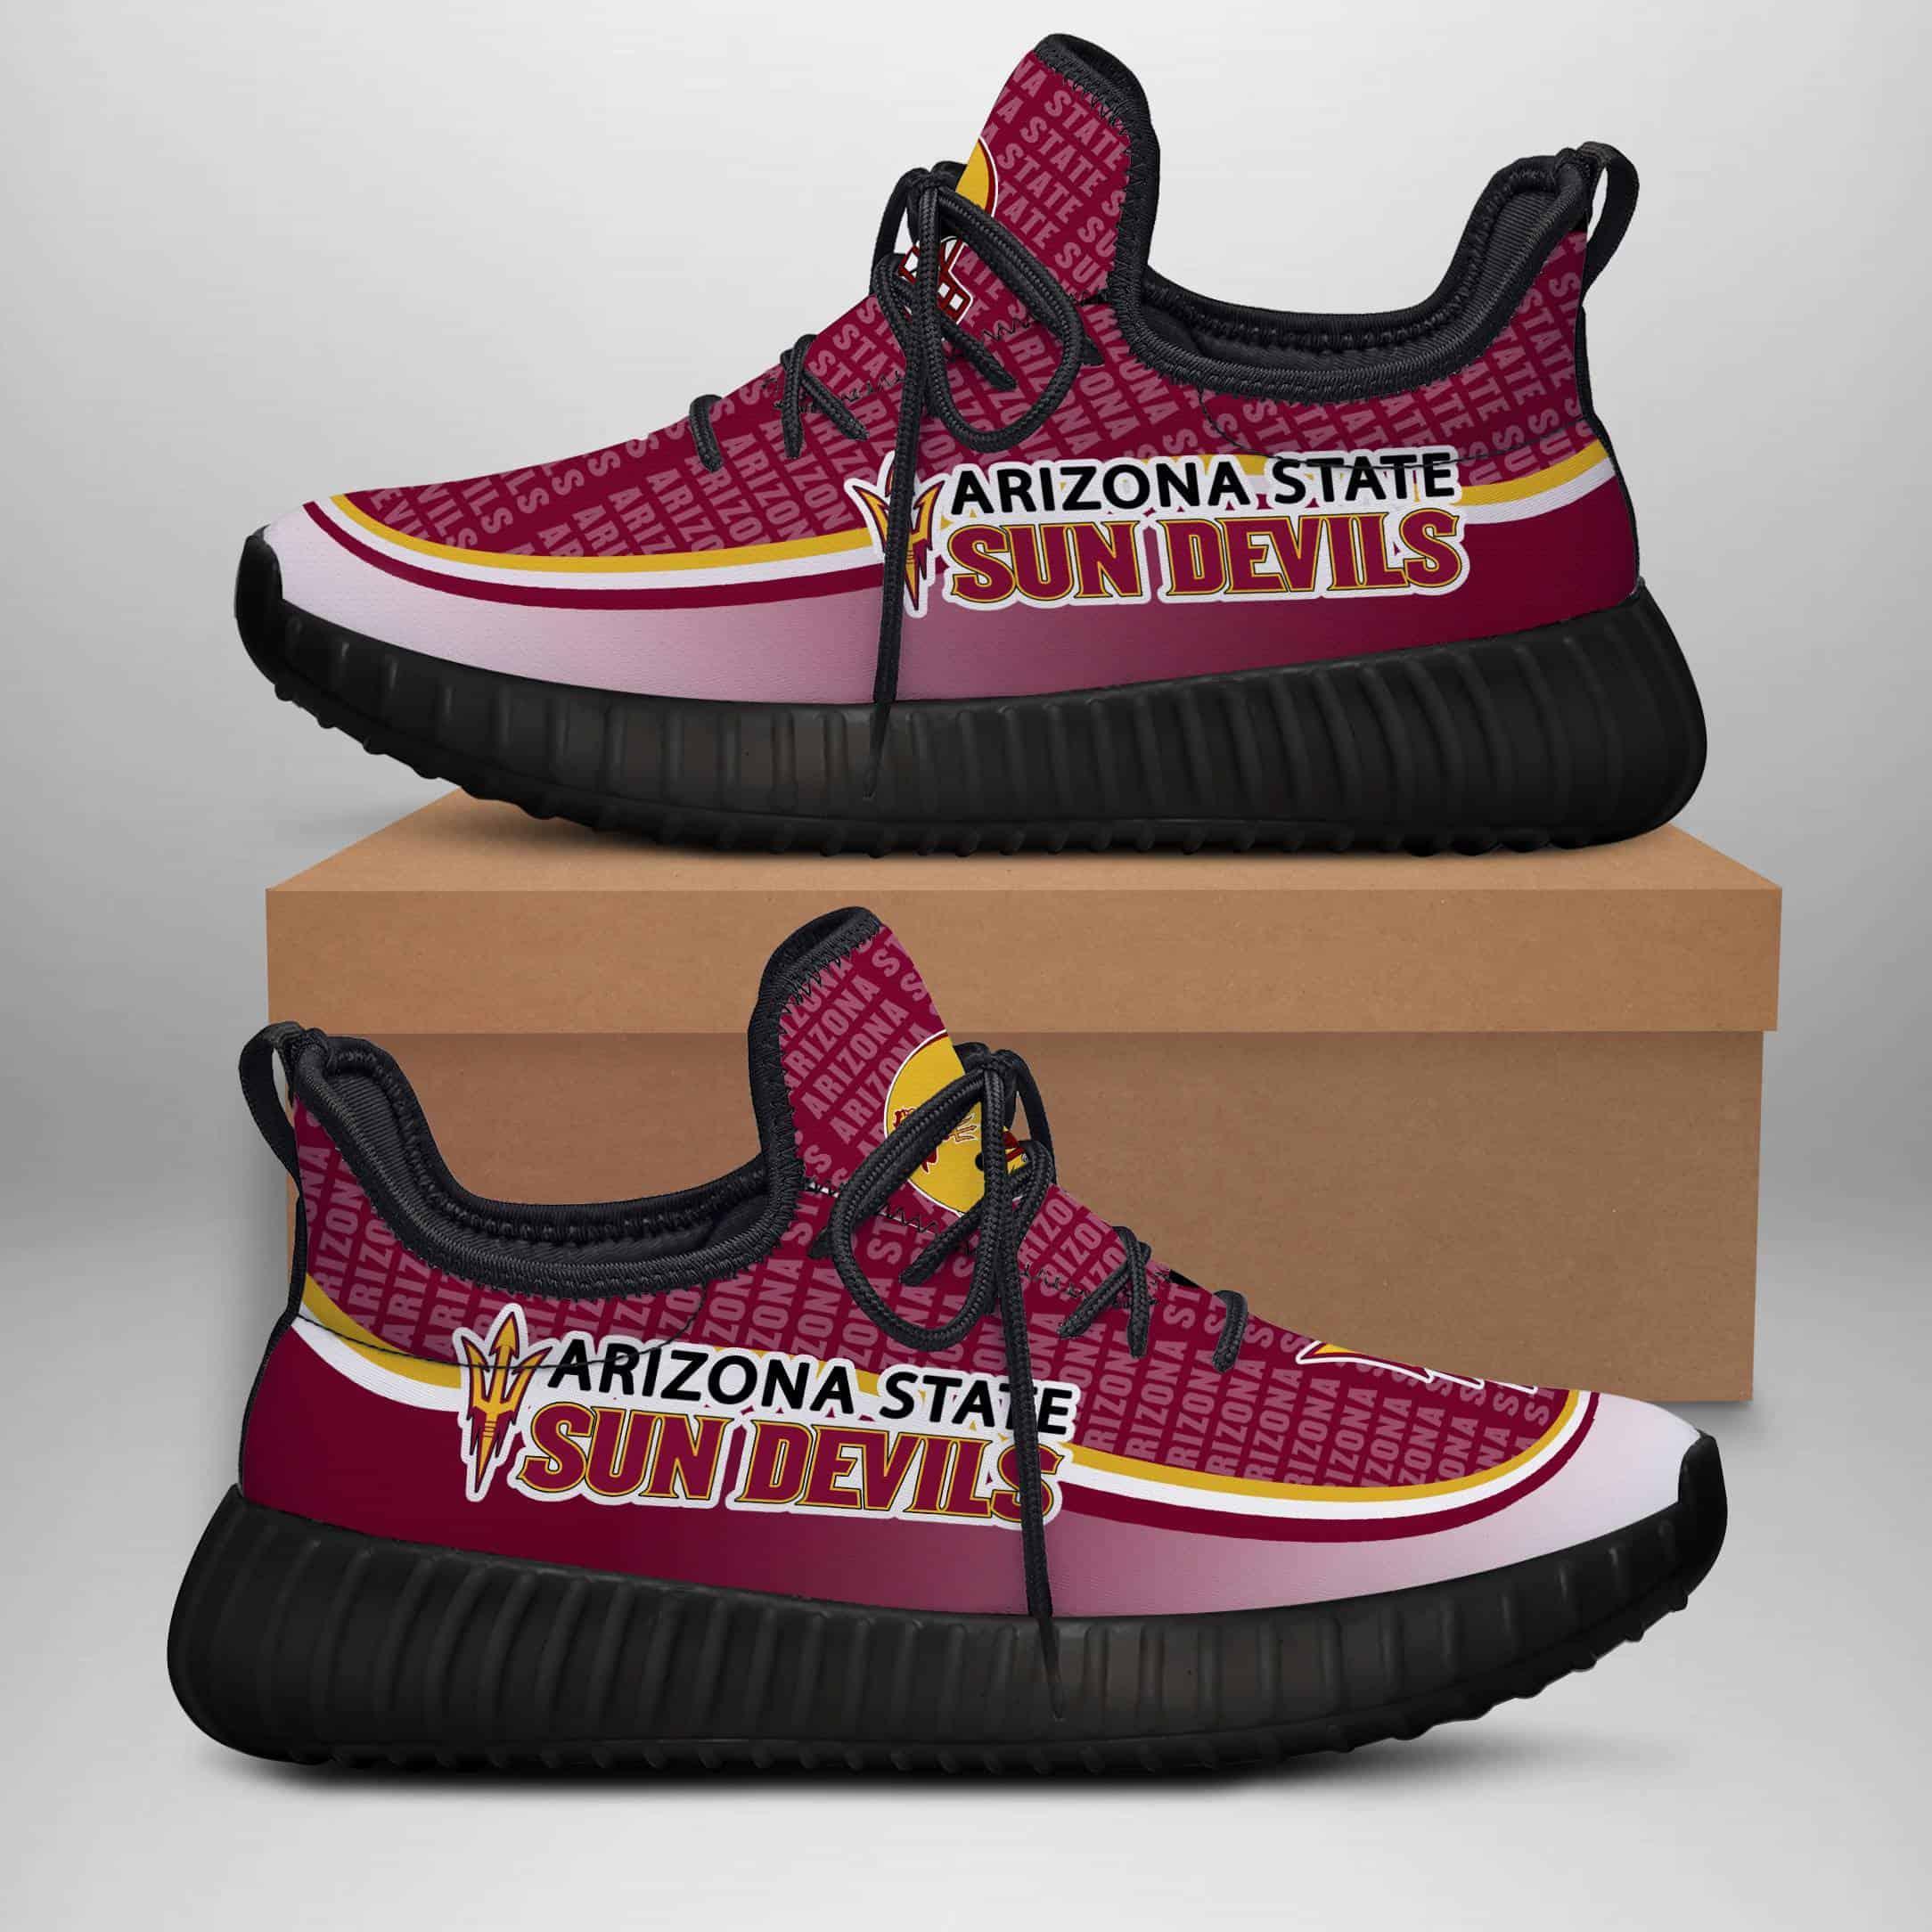 Arizona State Sun Devils New Sneaker